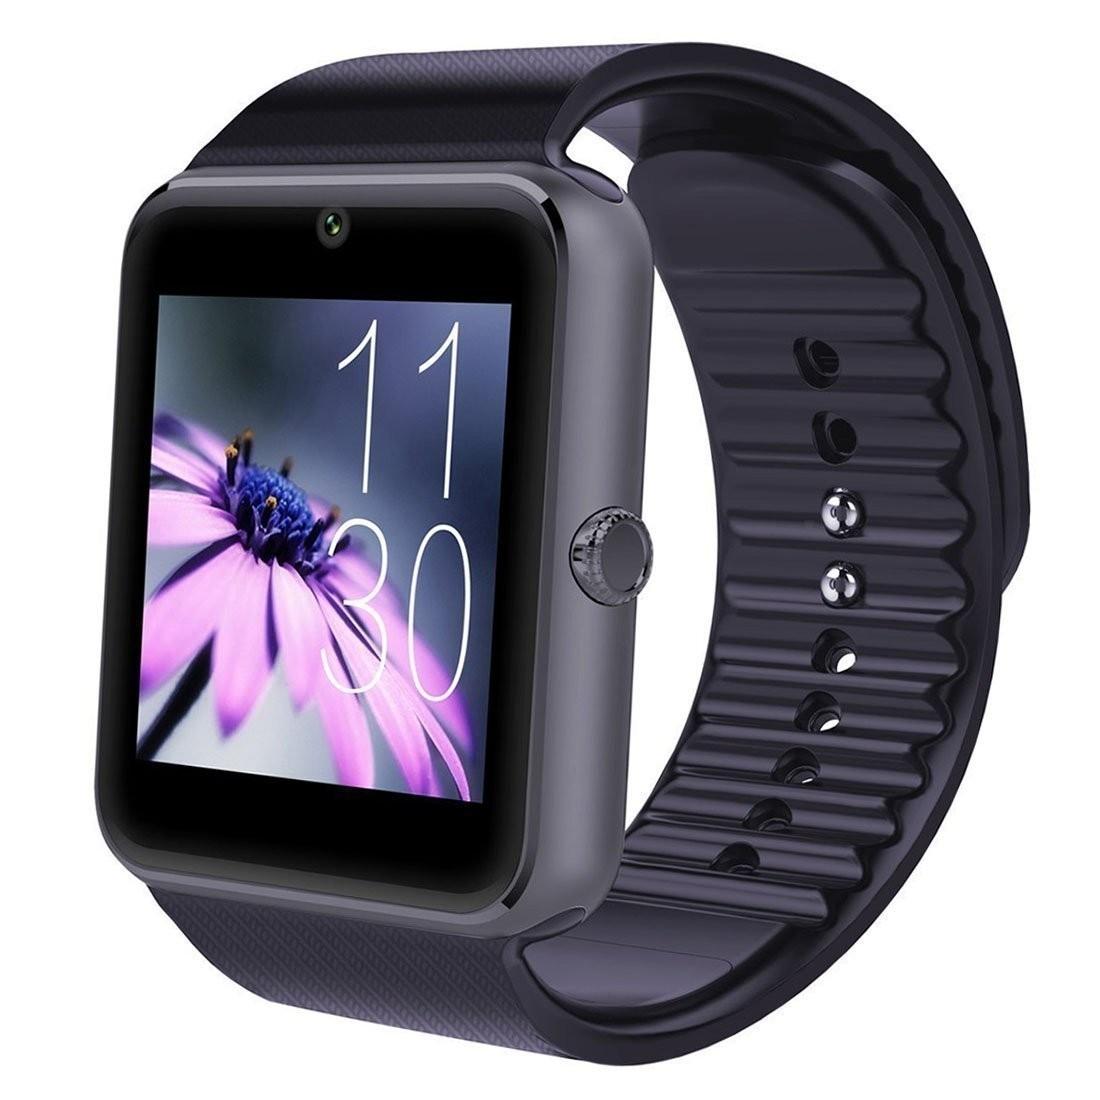 Ceas Smartwatch cu Telefon iUni GT08, Bluetooth, Camera 1.3 MP, Ecran LCD antizgarieturi, Black imagine techstar.ro 2021